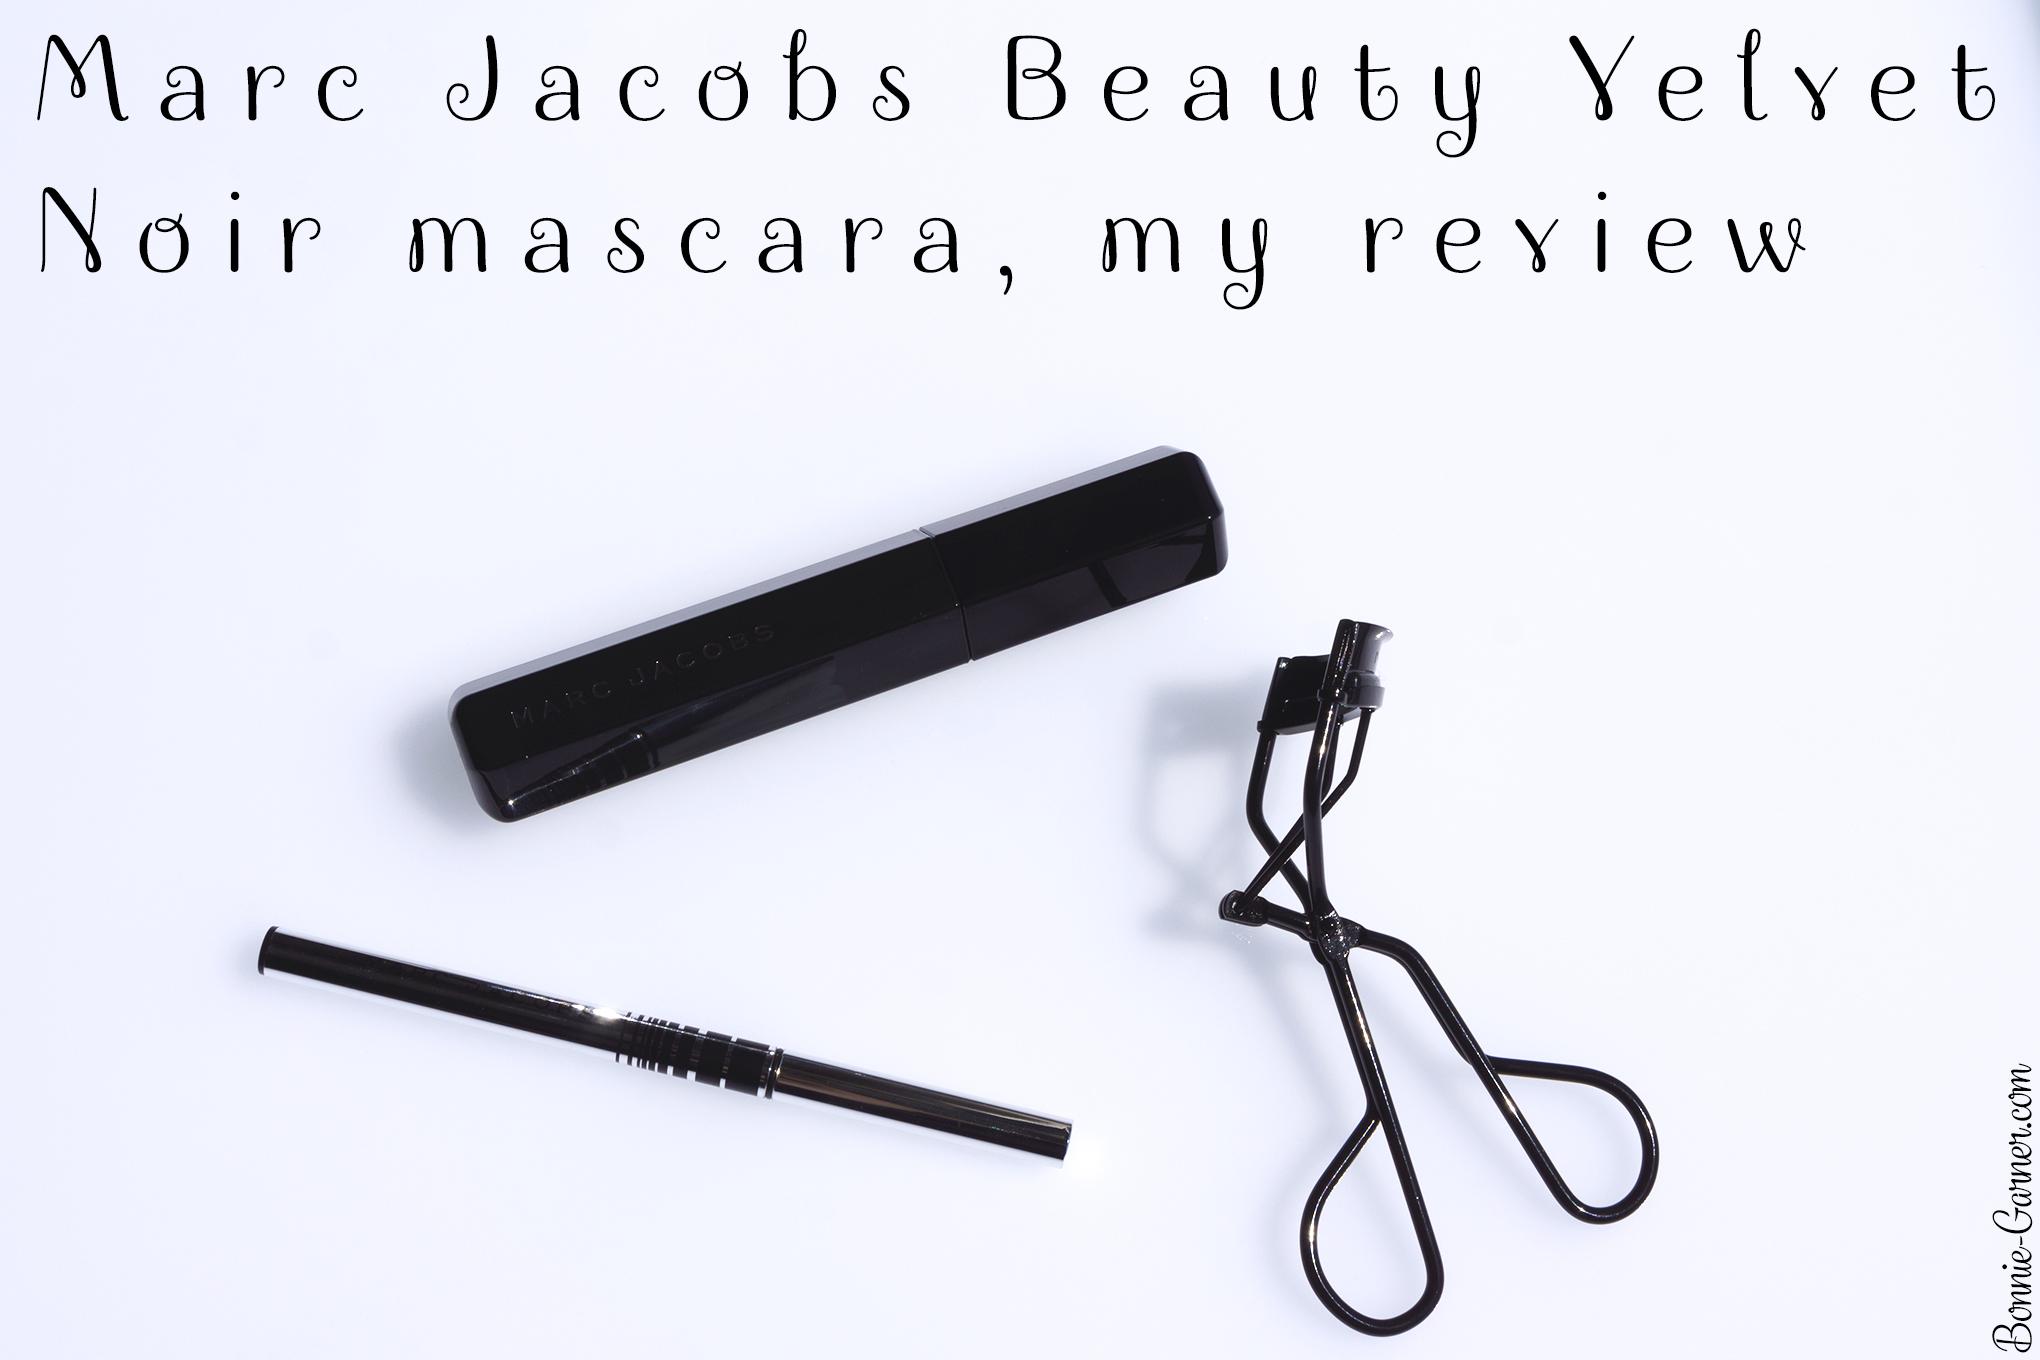 Marc Jacobs Beauty Velvet Noir mascara, my review